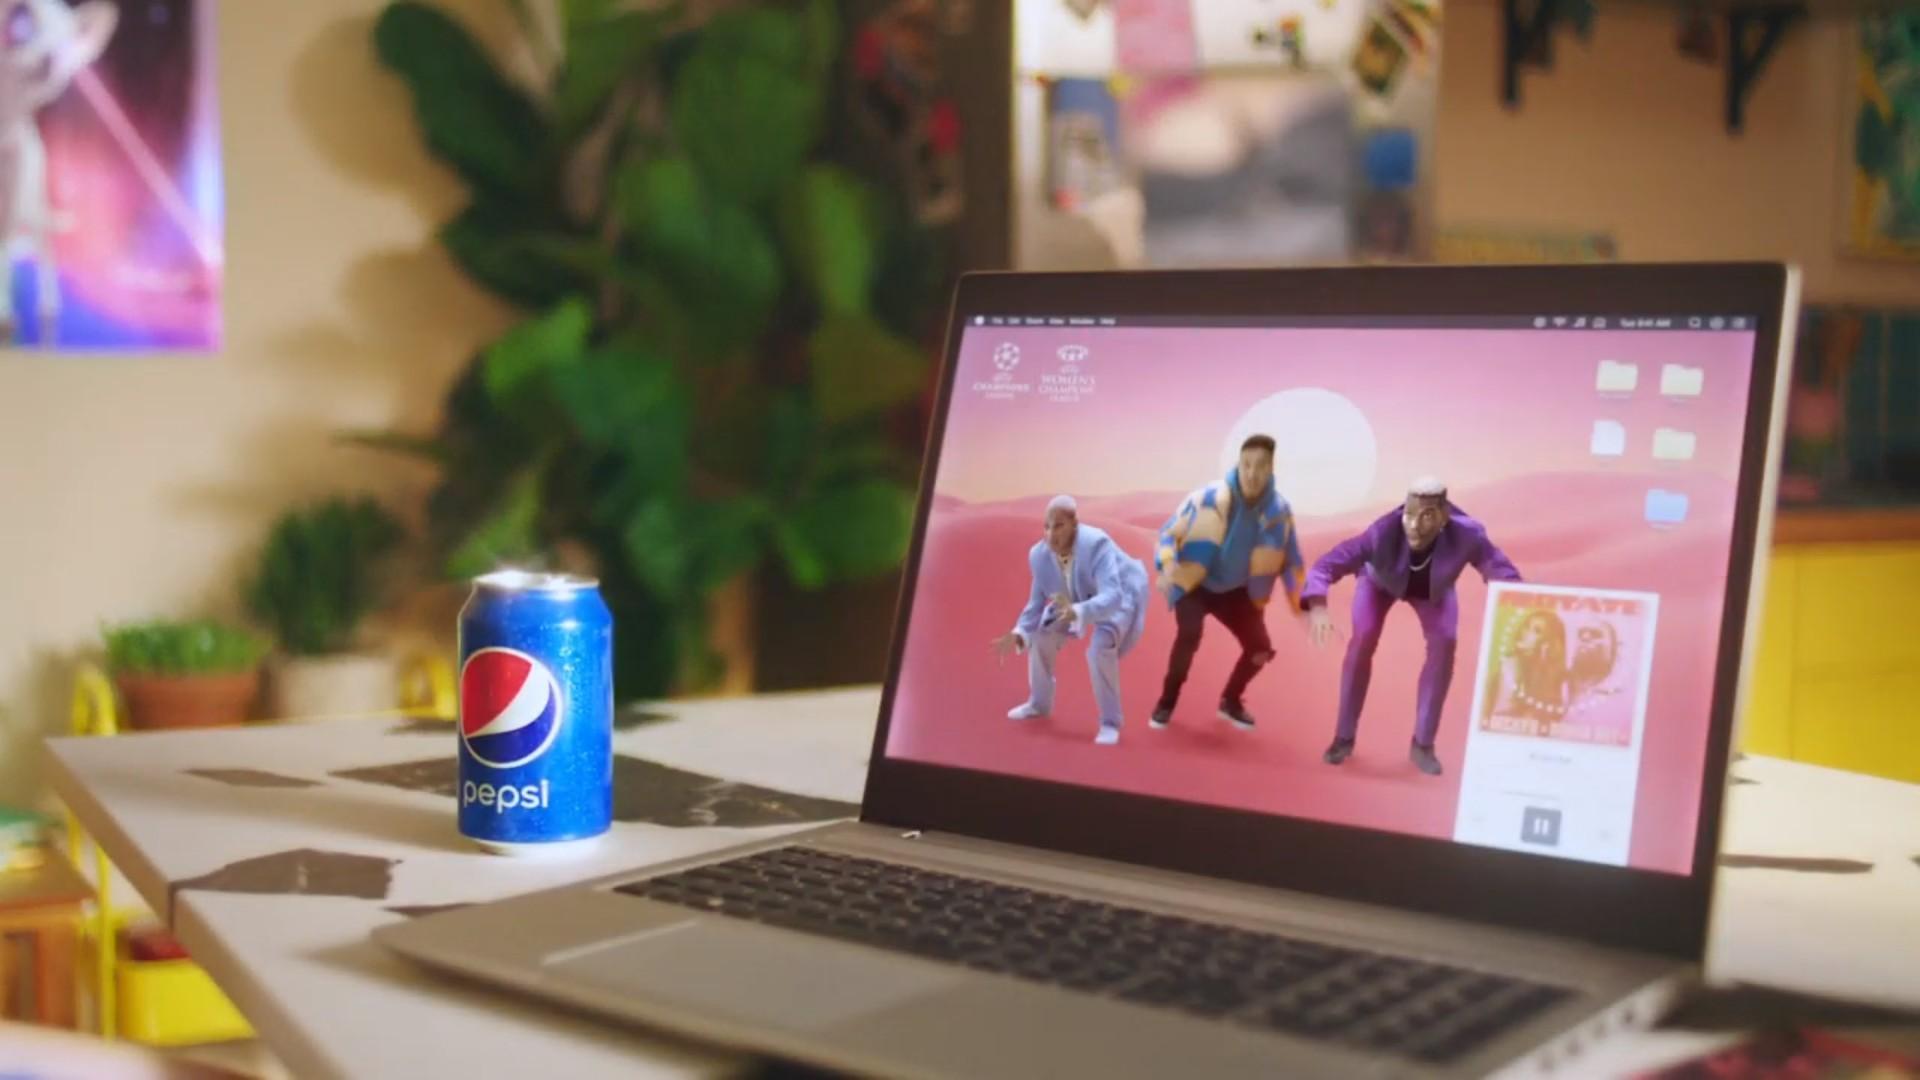 Pepsi x Paul Pogba Fizz To Live (football) 2021